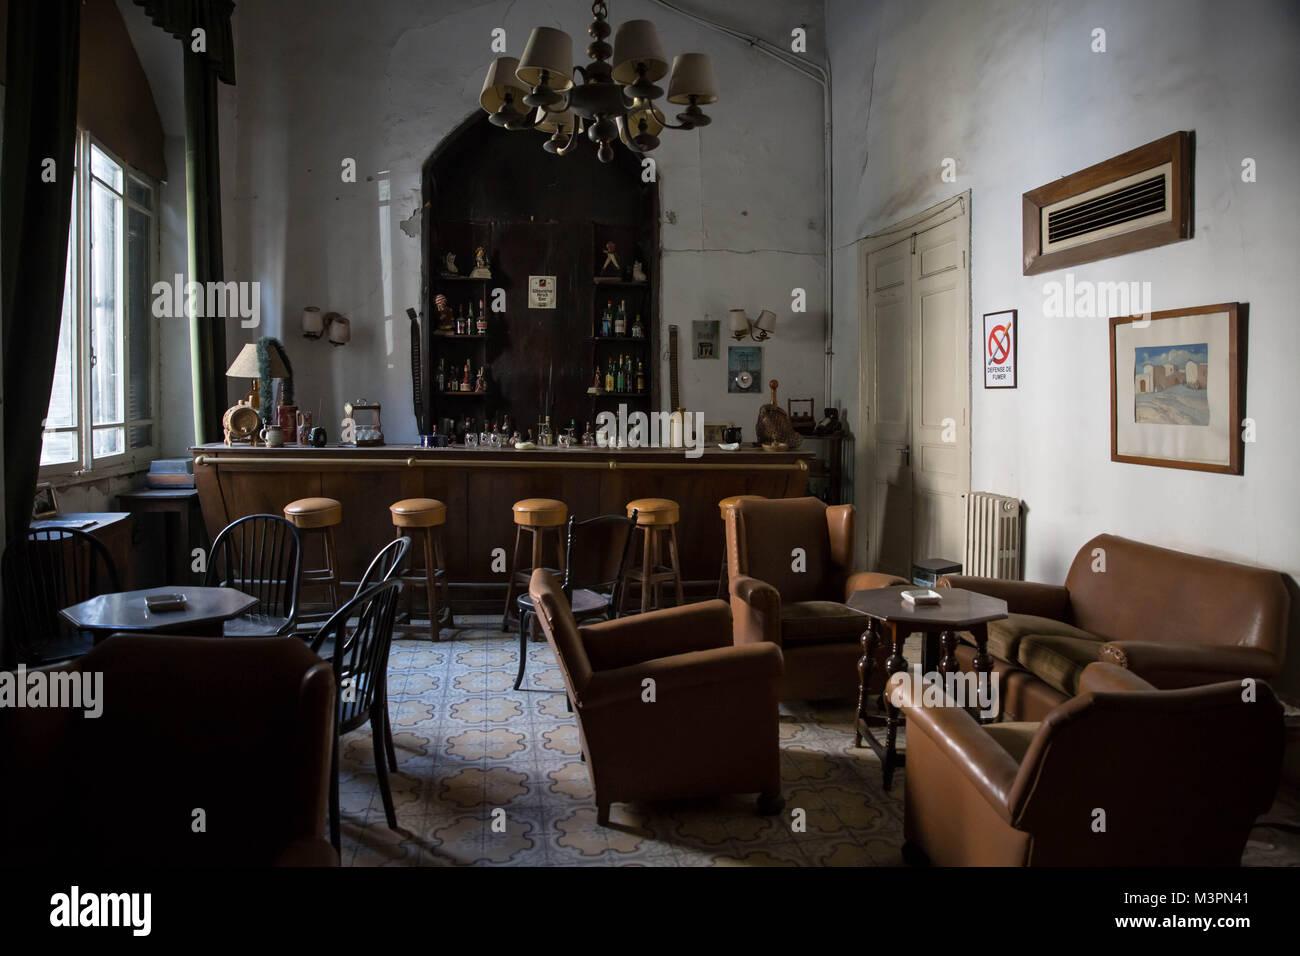 Aleppo, Syria. 2nd Nov, 2017. The bar of Aleppo's Baron Hotel.Aleppo's historic Baron Hotel was founded - Stock Image